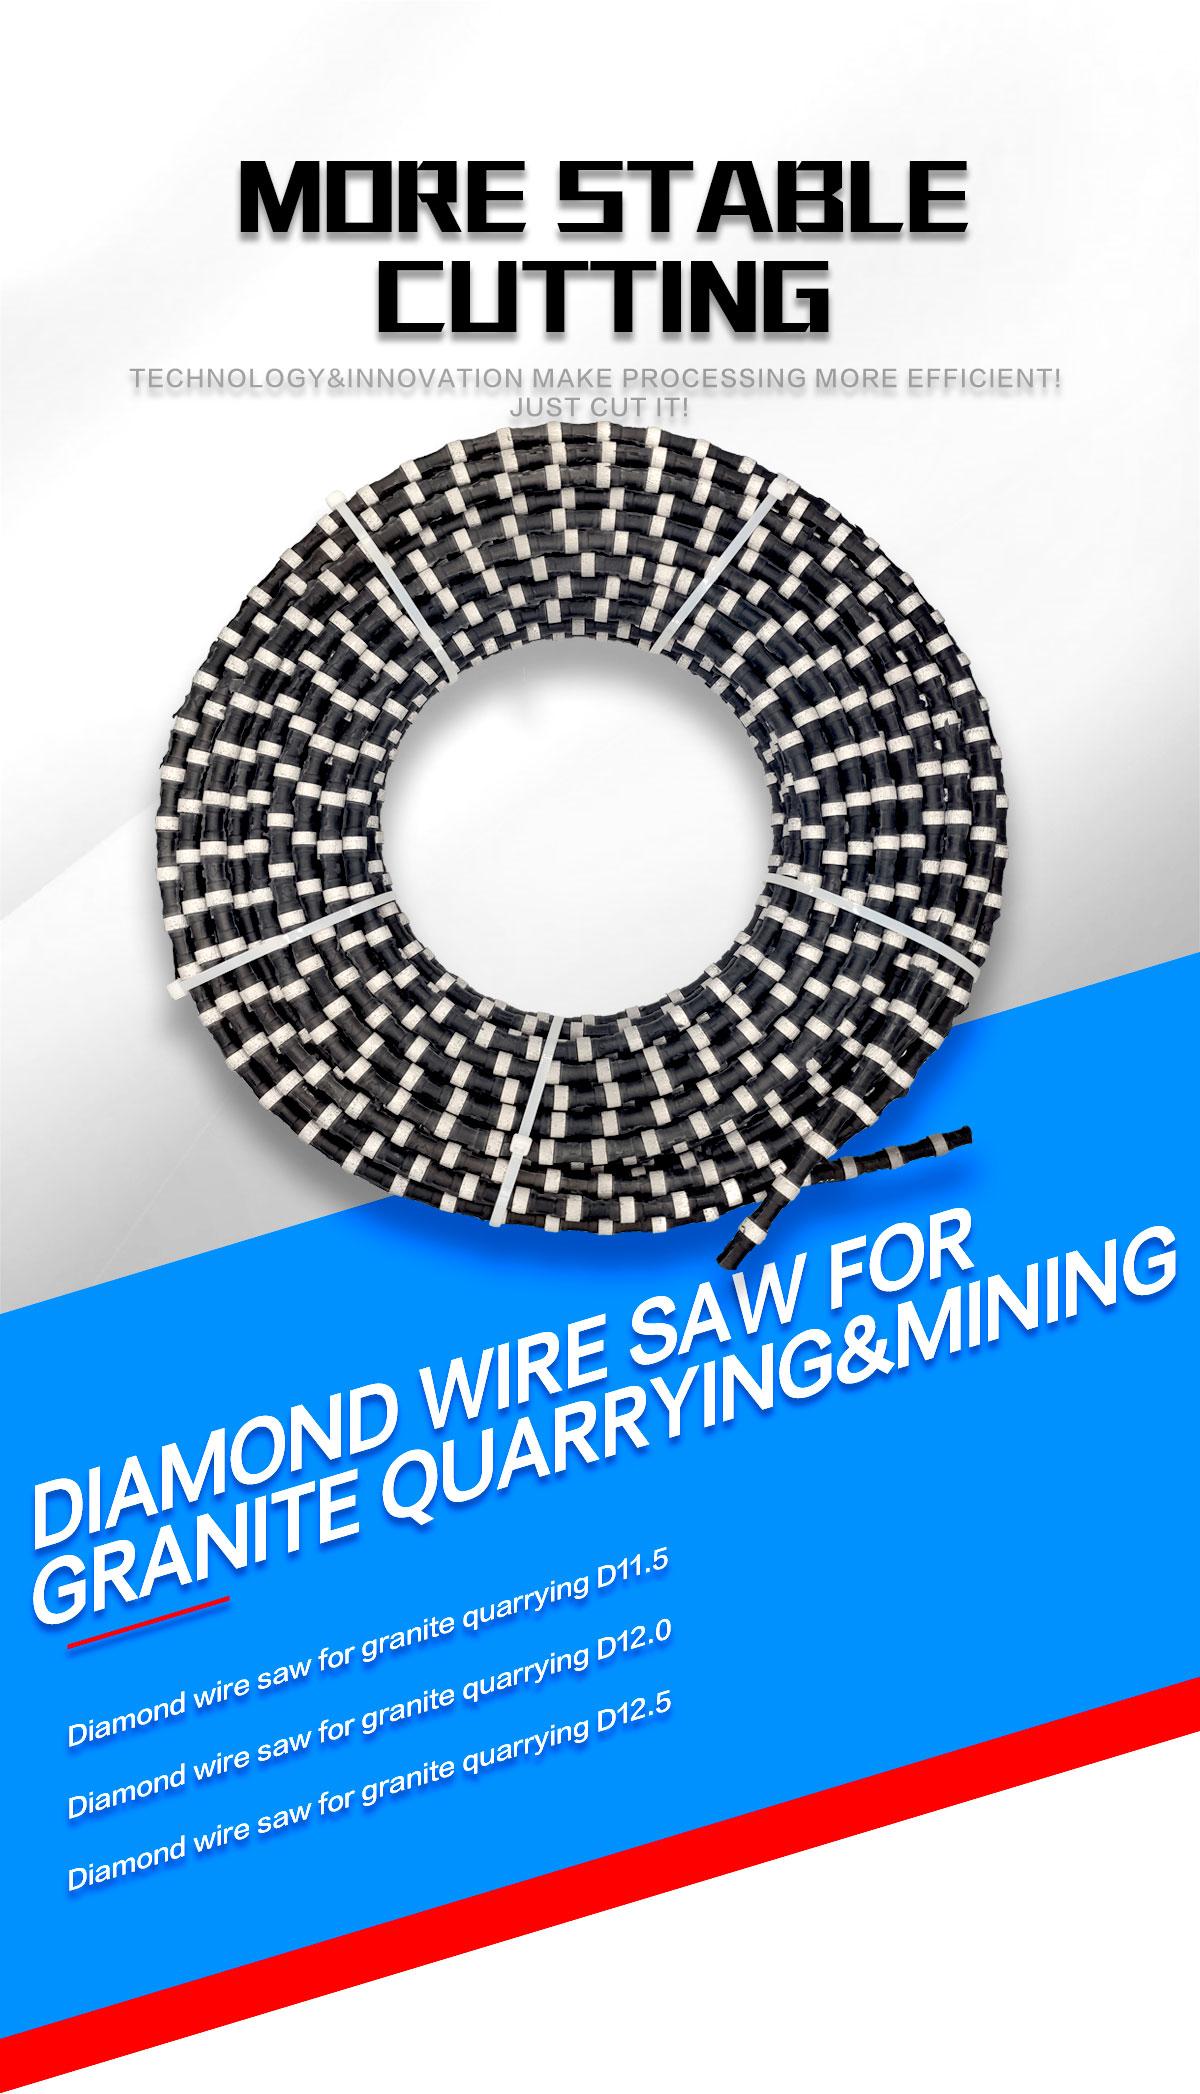 diamond wire saw for mining